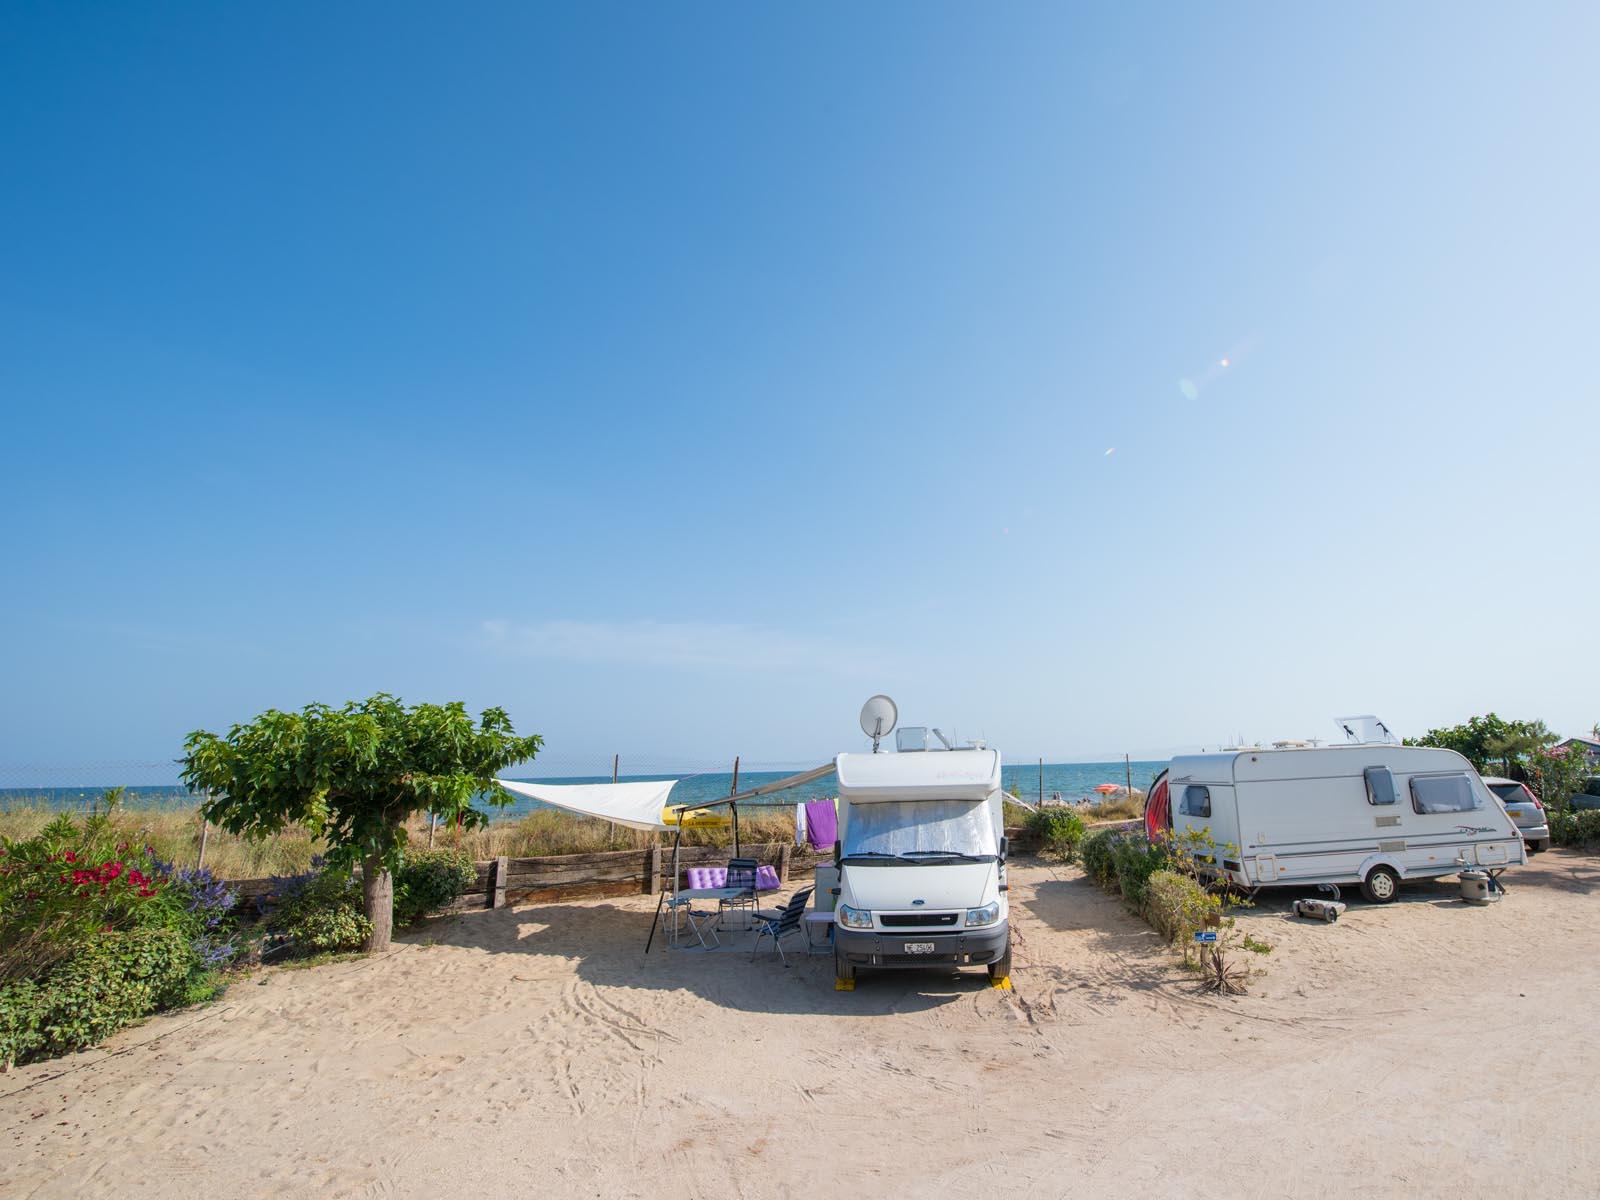 Emplacements de camping au bord de la mer